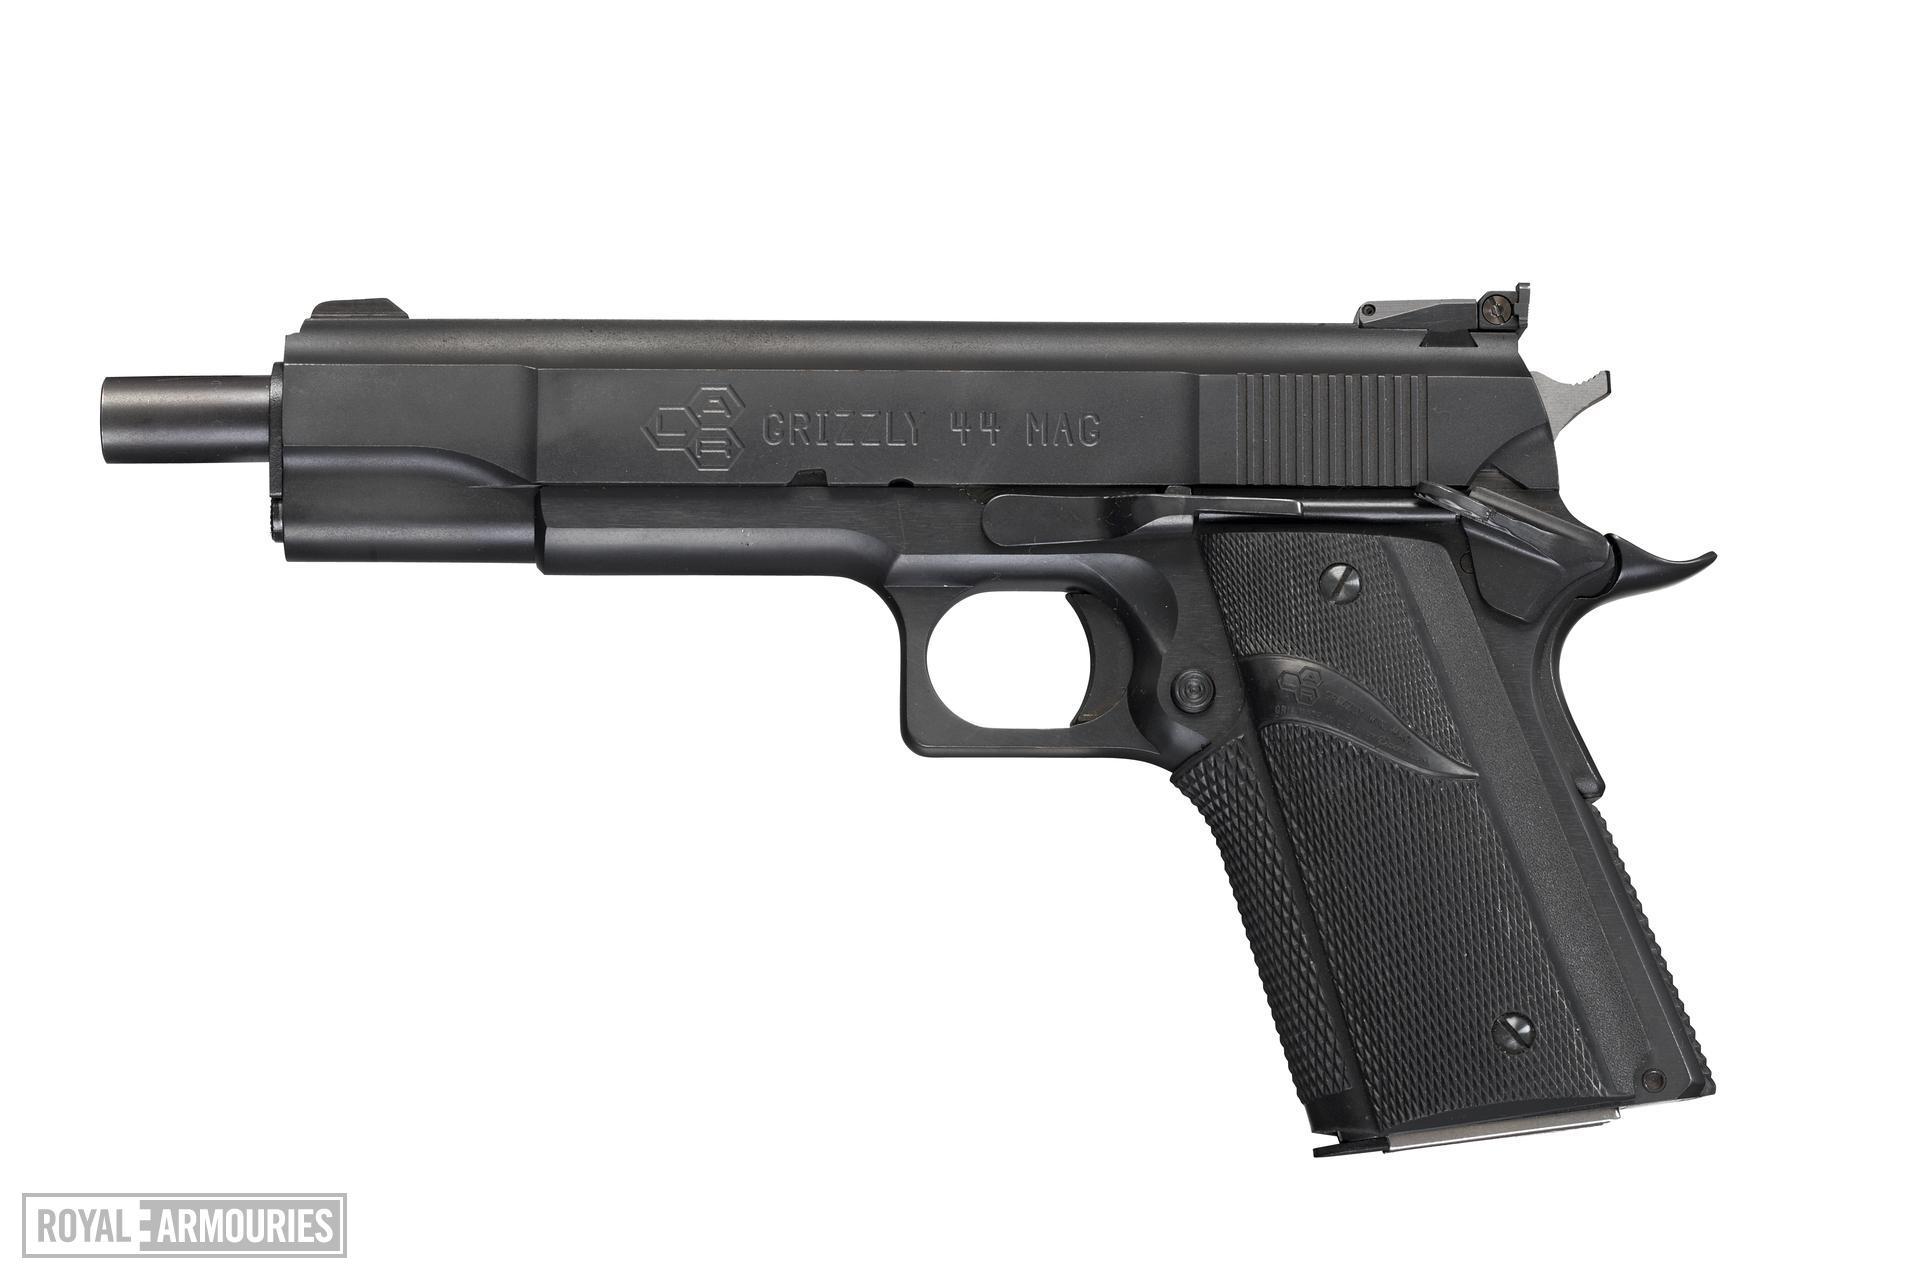 Centrefire self-loading pistol - LAR Grizzly Mk.IV